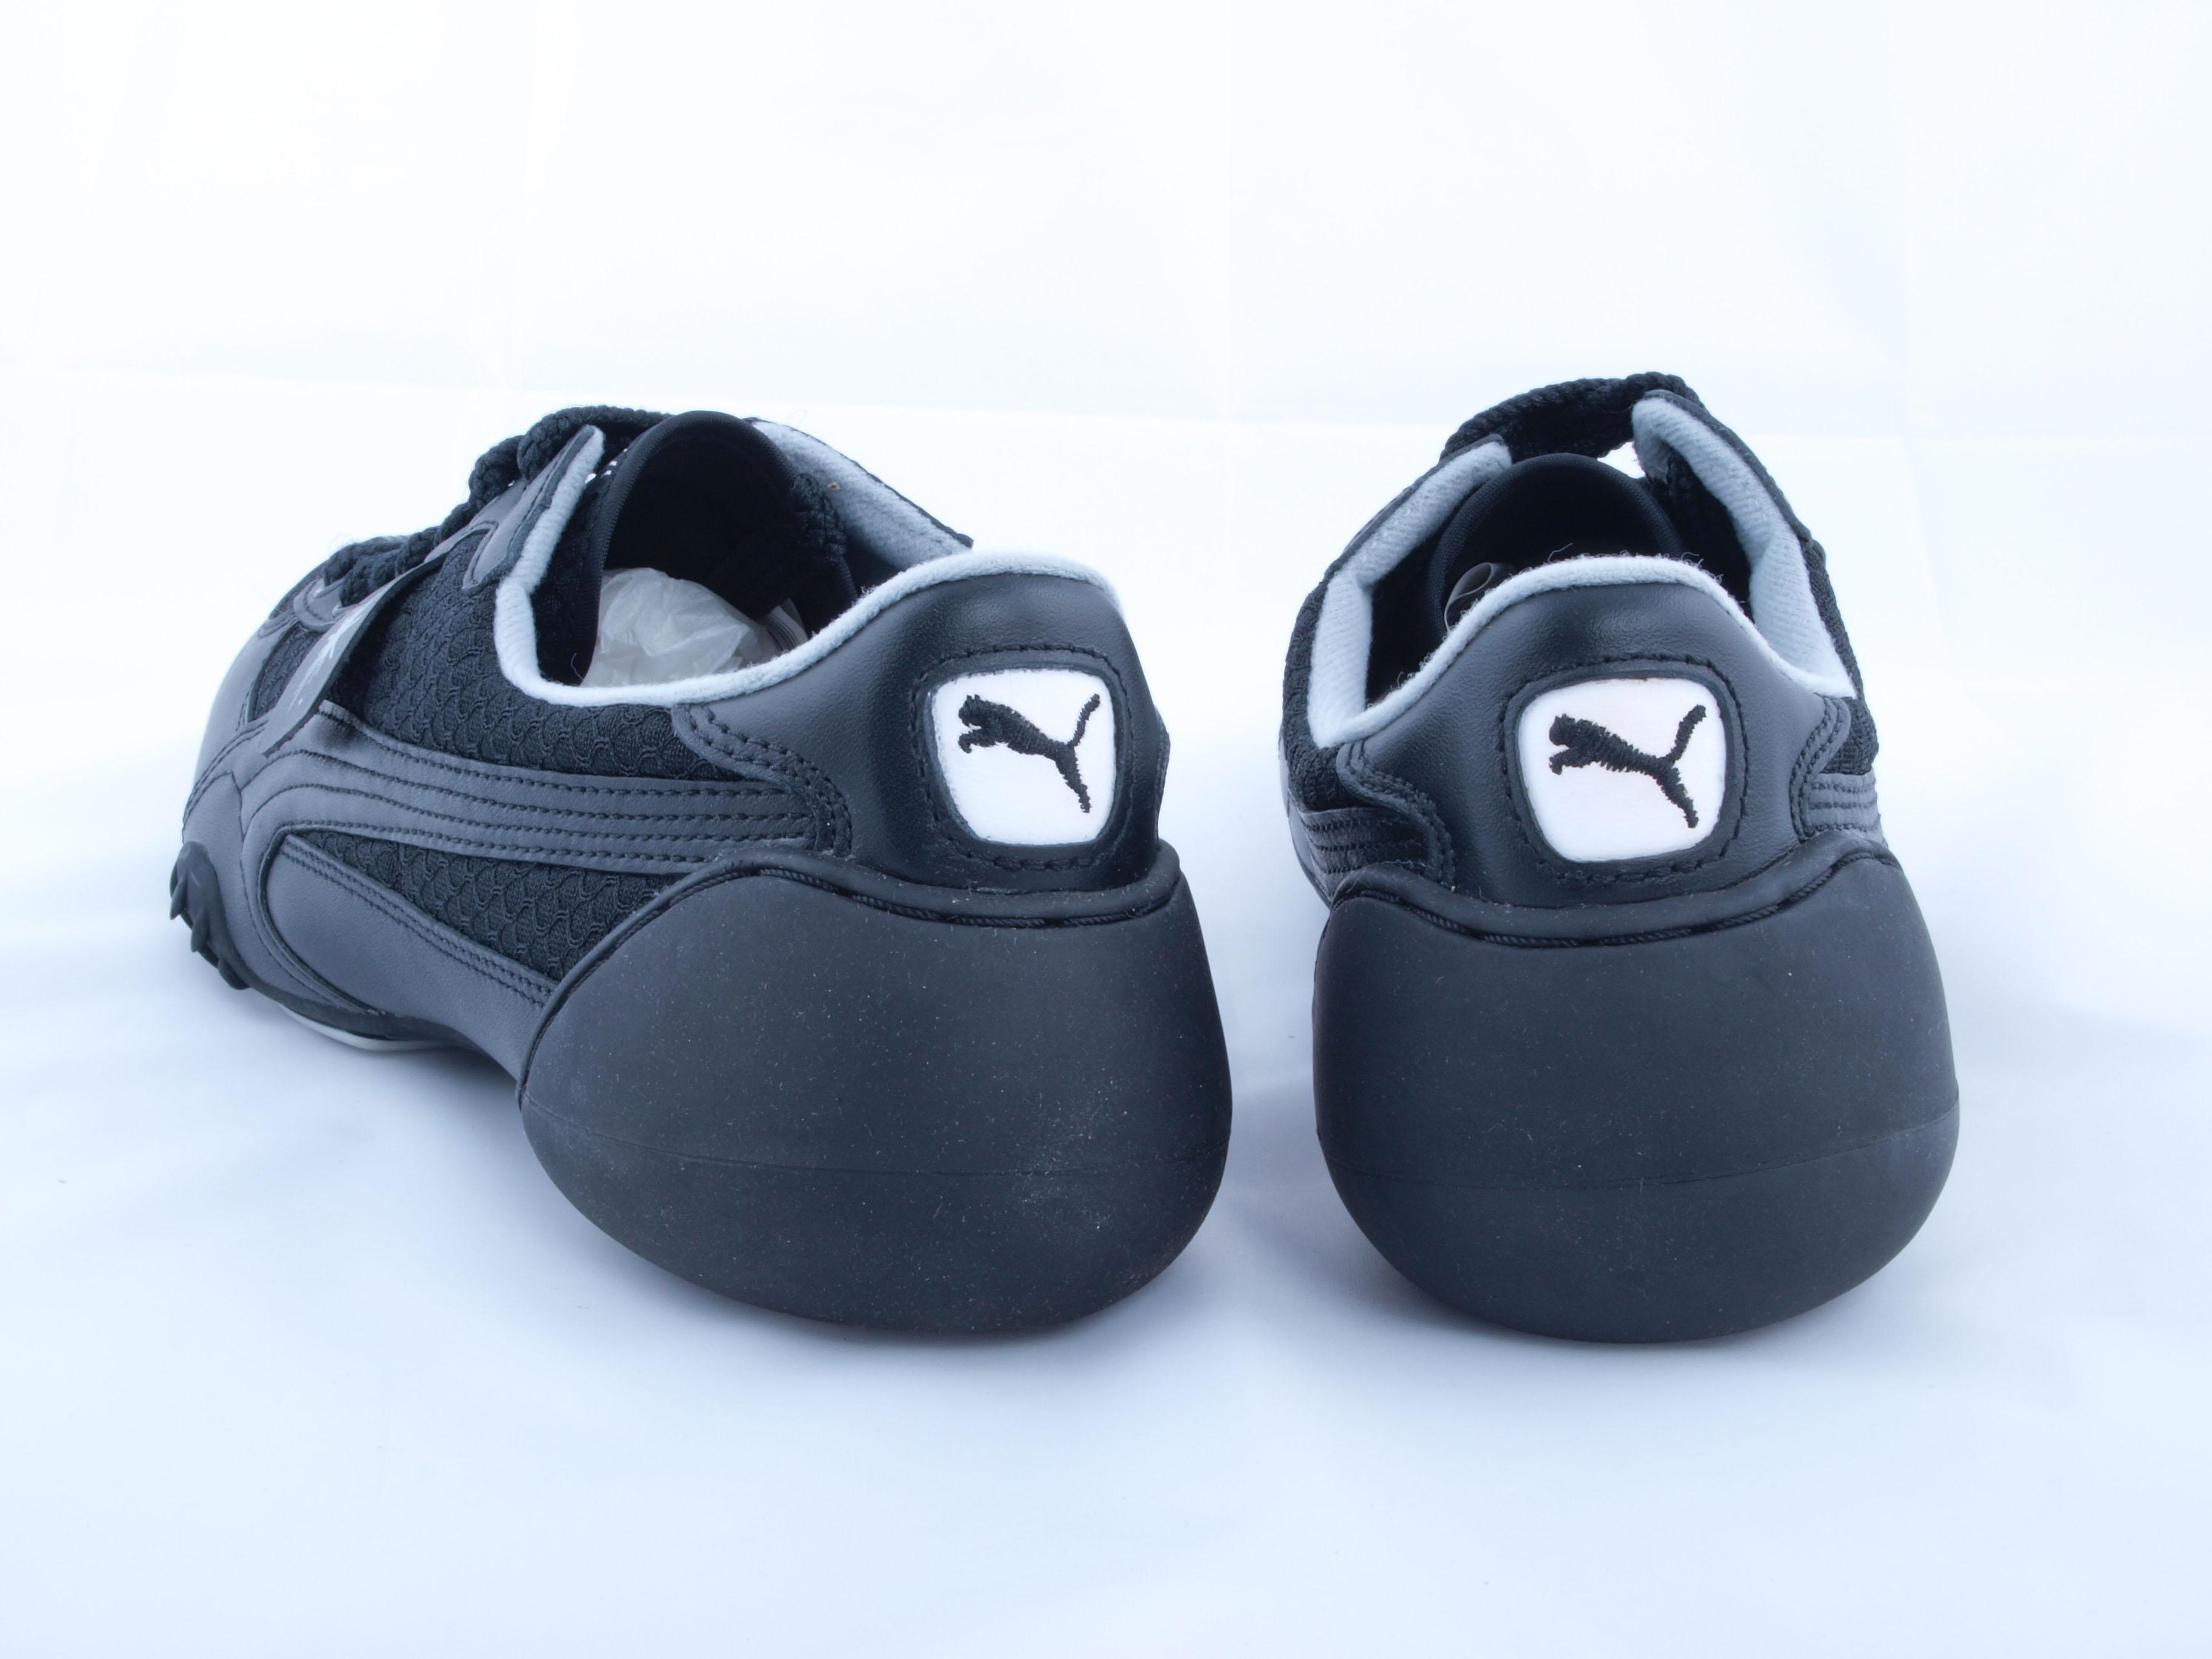 0ed00afbcaba5d Buy puma by miharayasuhiro sneakers